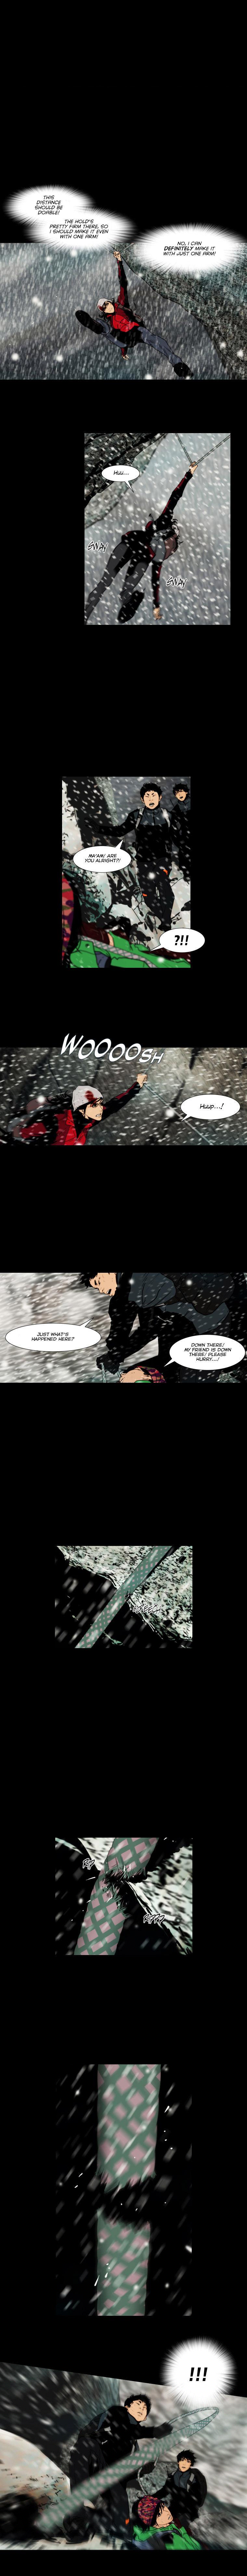 Peak (Im Gang-hyeok) 89 Page 2